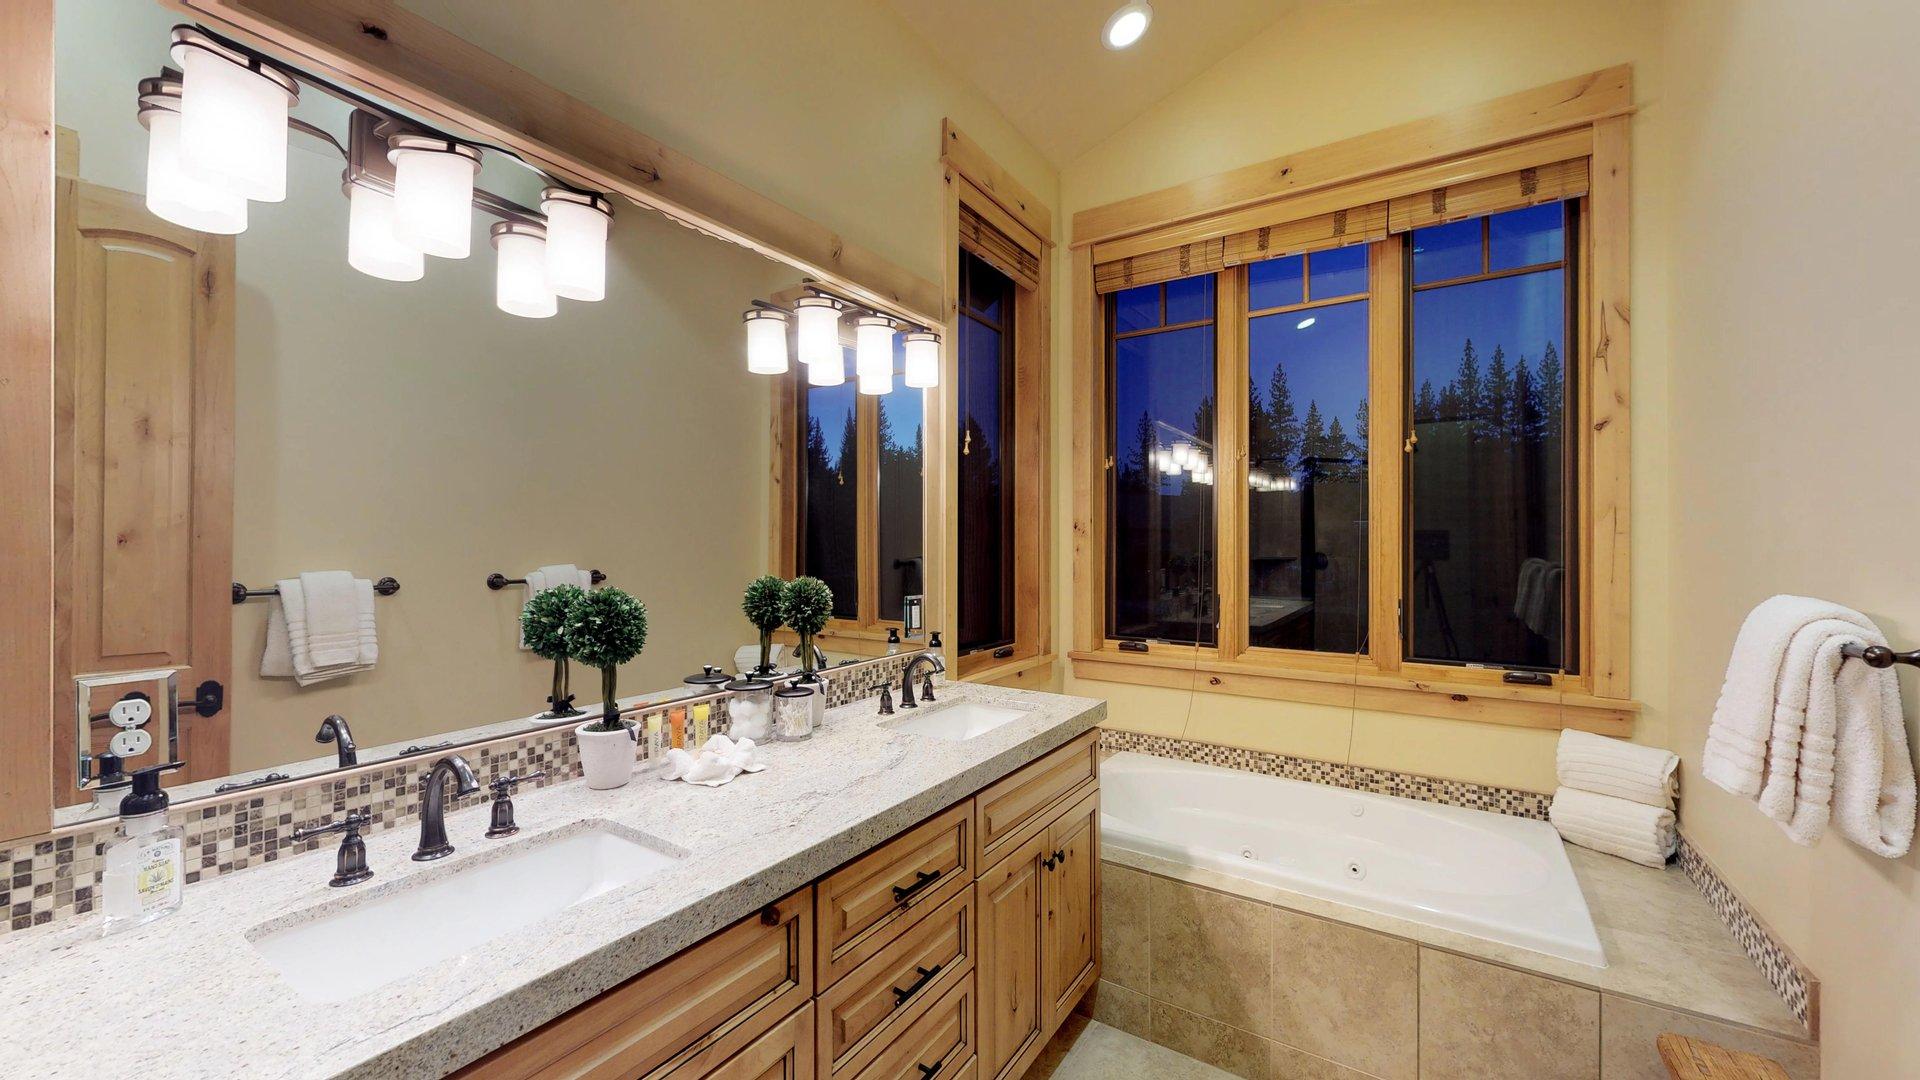 Double Vanity Mirror and Bathtub in Bathroom.